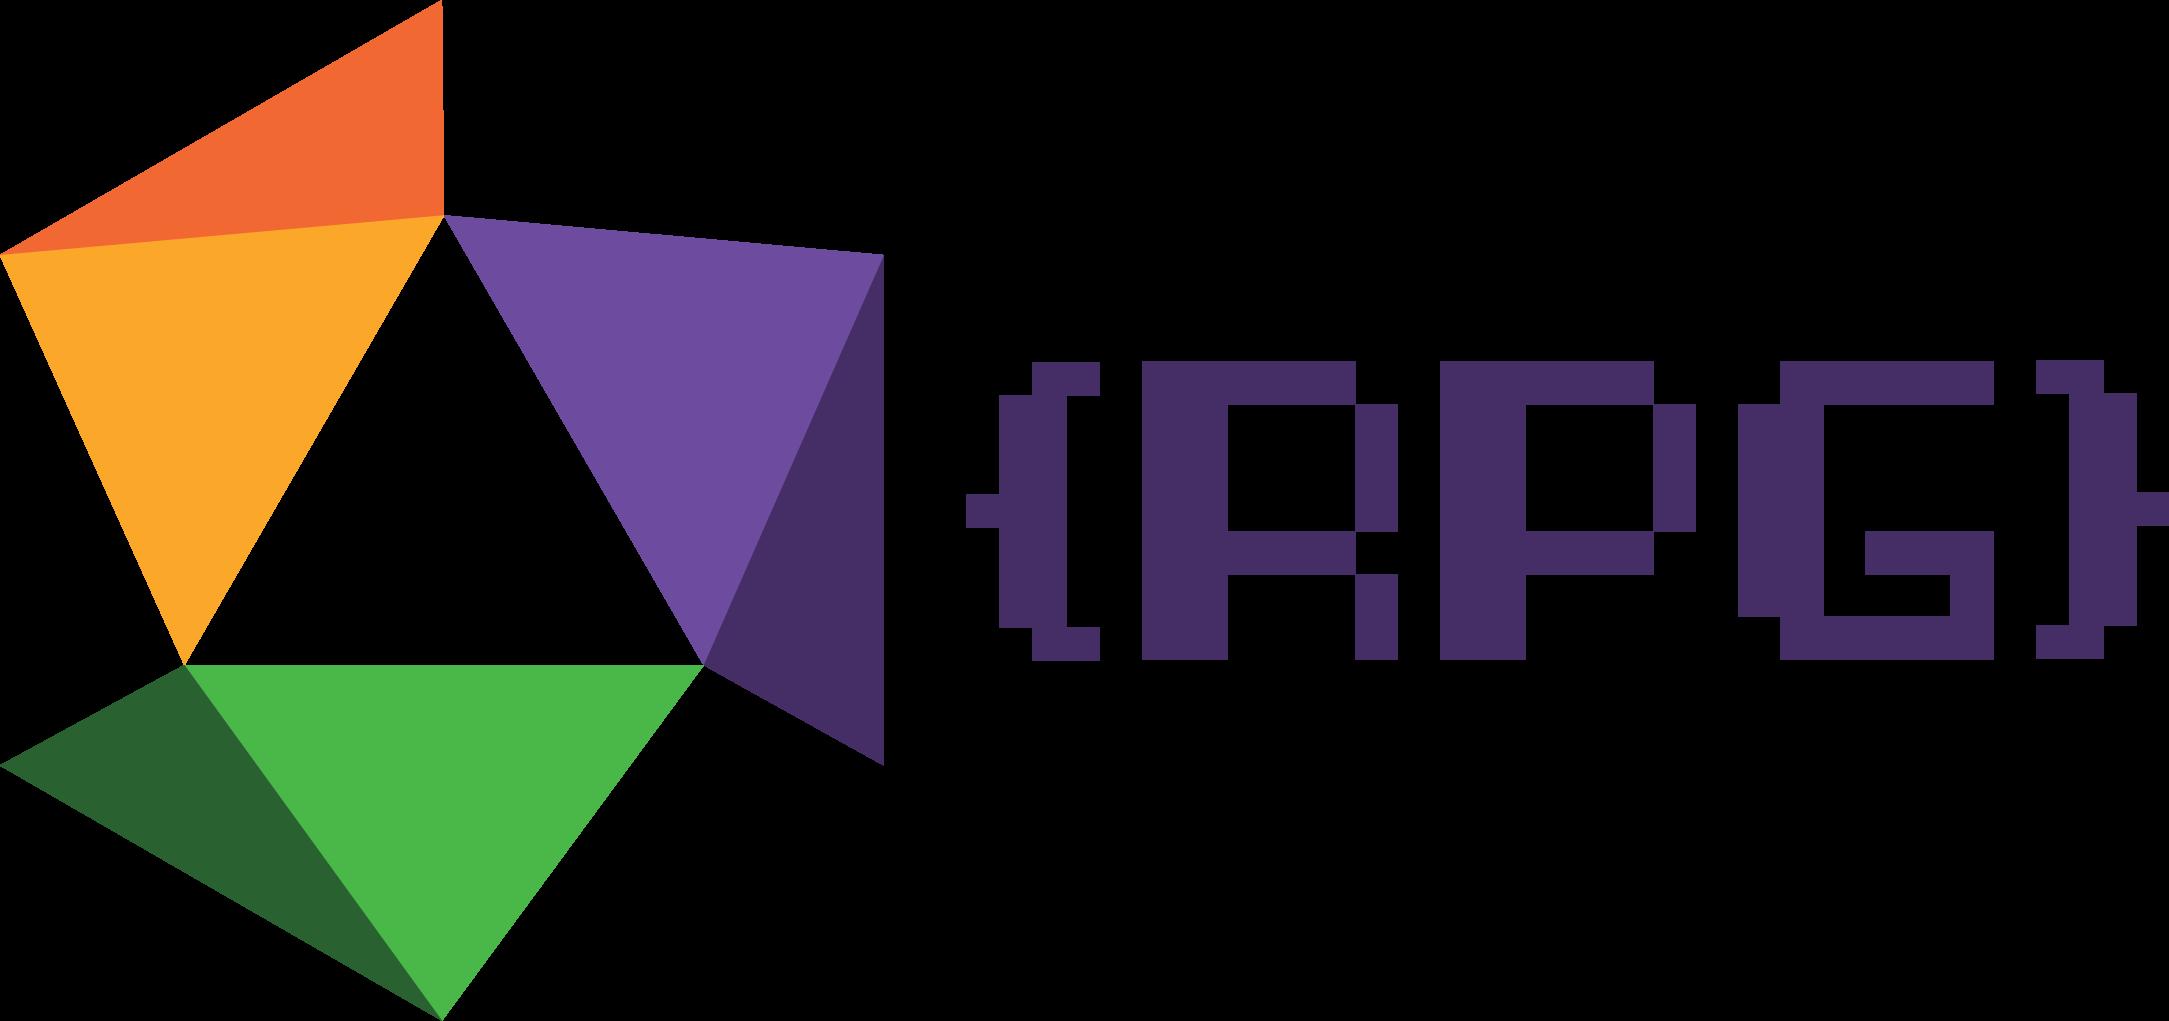 rio-puc-games-logo.png